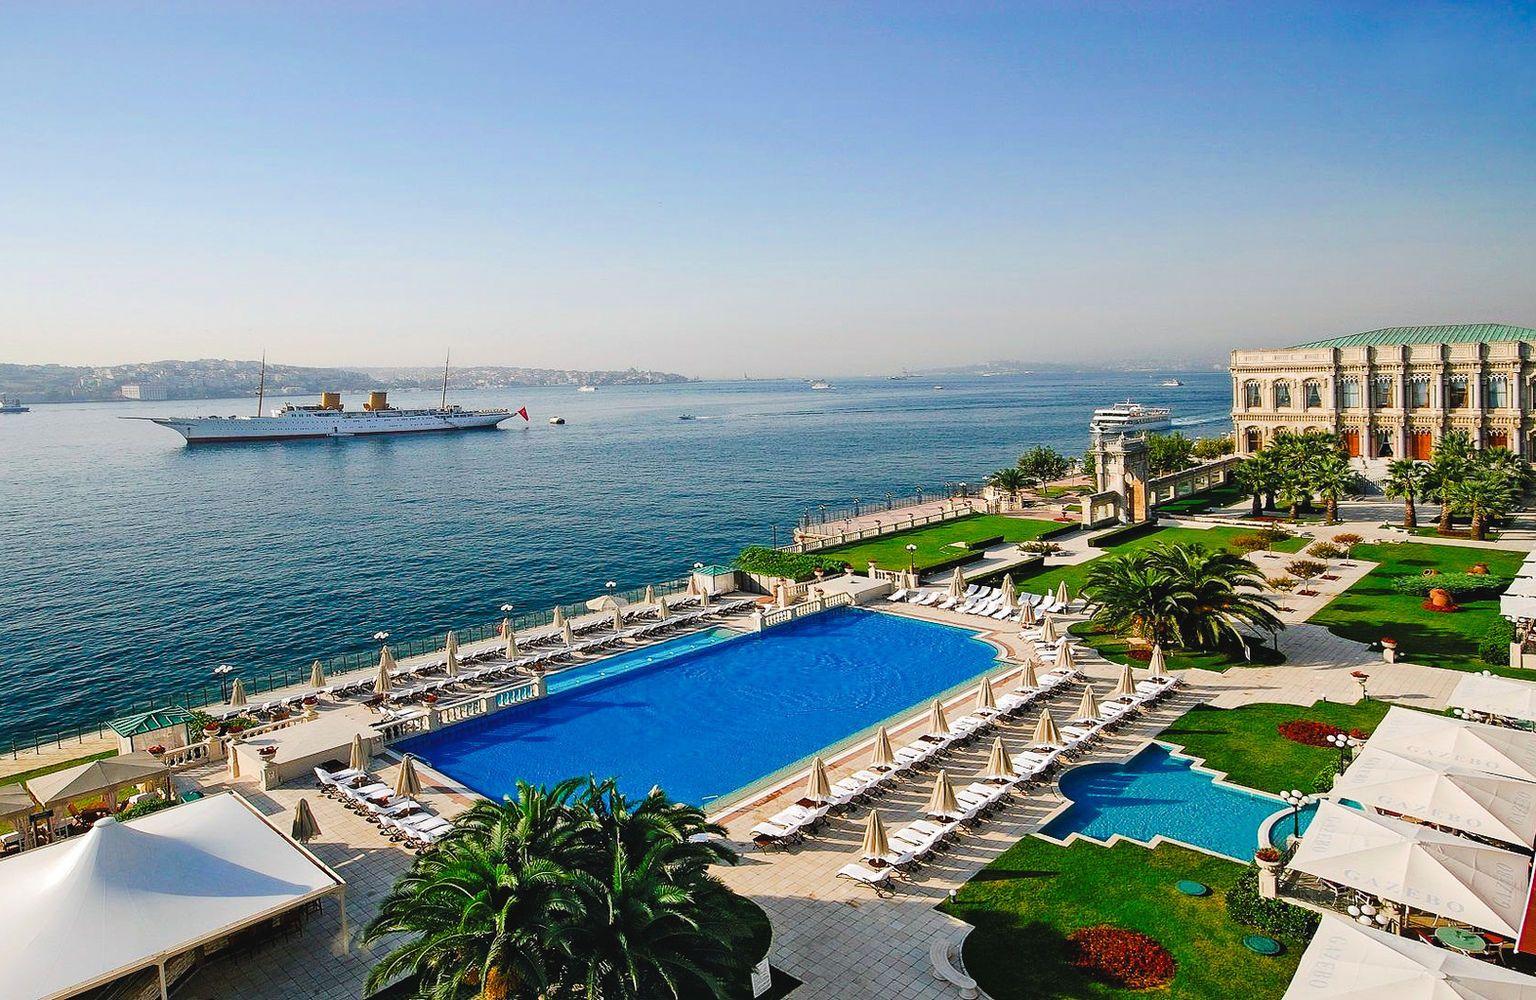 Divan Istanbul Hotel Istanbul Turkey Book Divan Istanbul Hotel Online